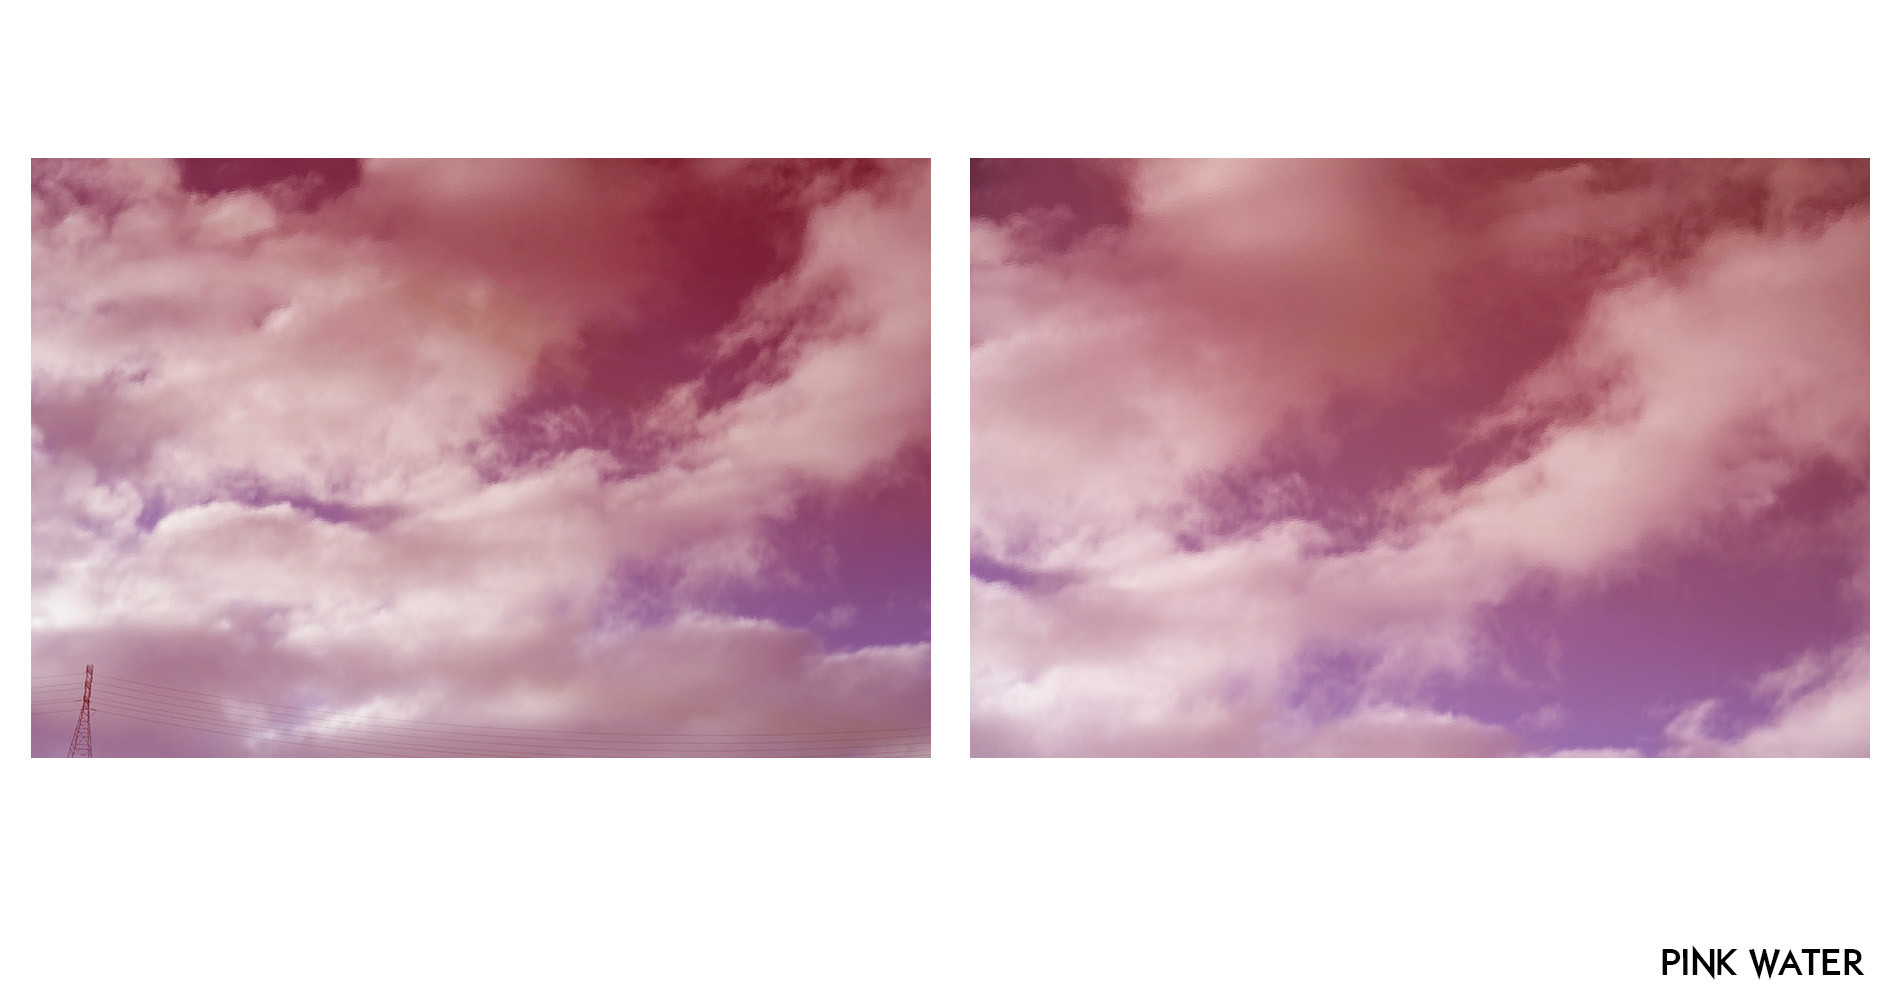 pinkwater.jpg